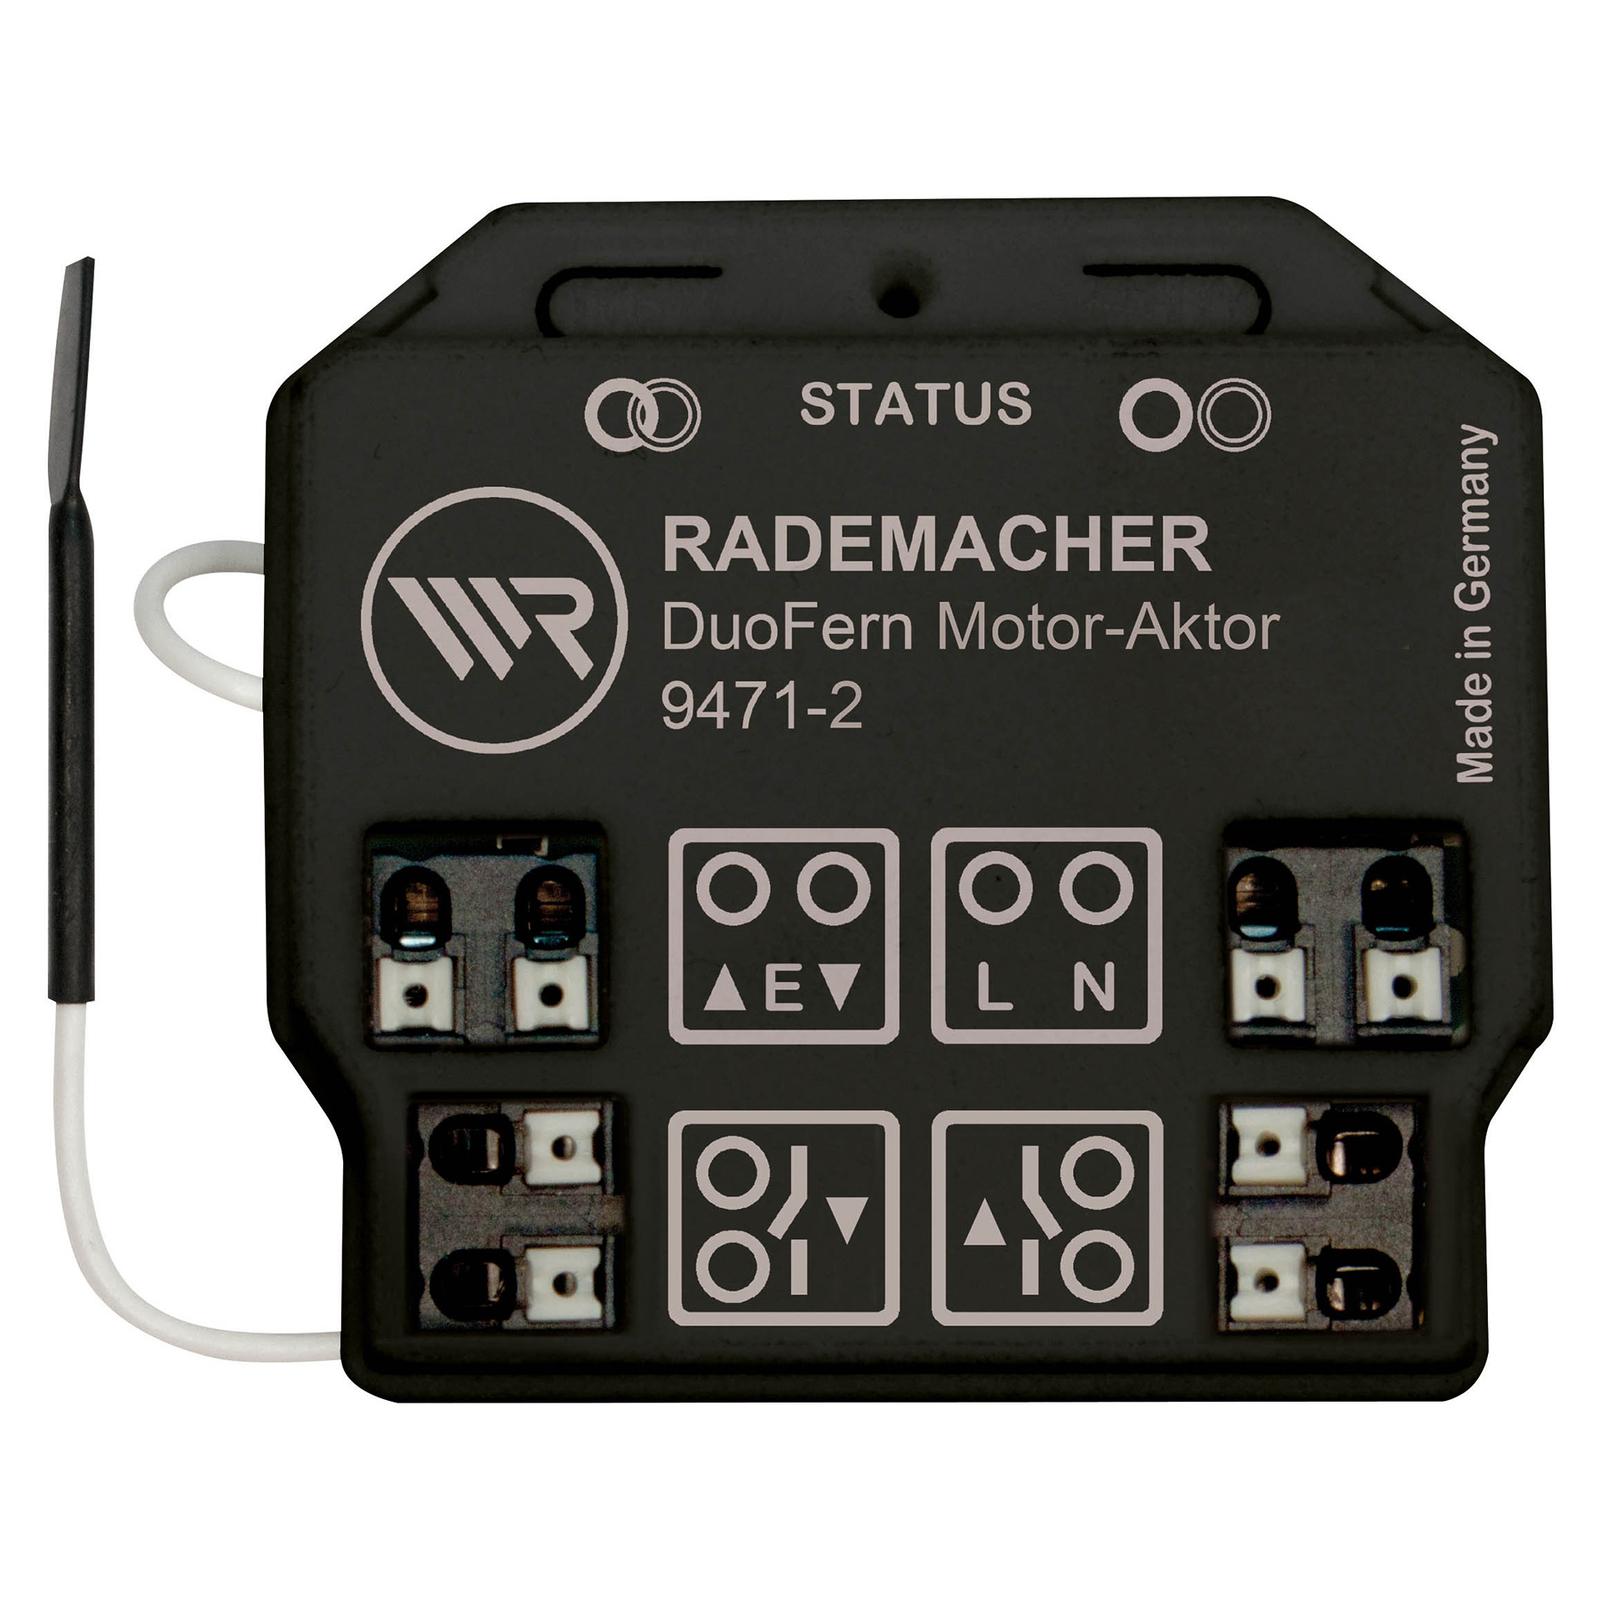 Rademacher DuoFern silnik rurowy-aktor